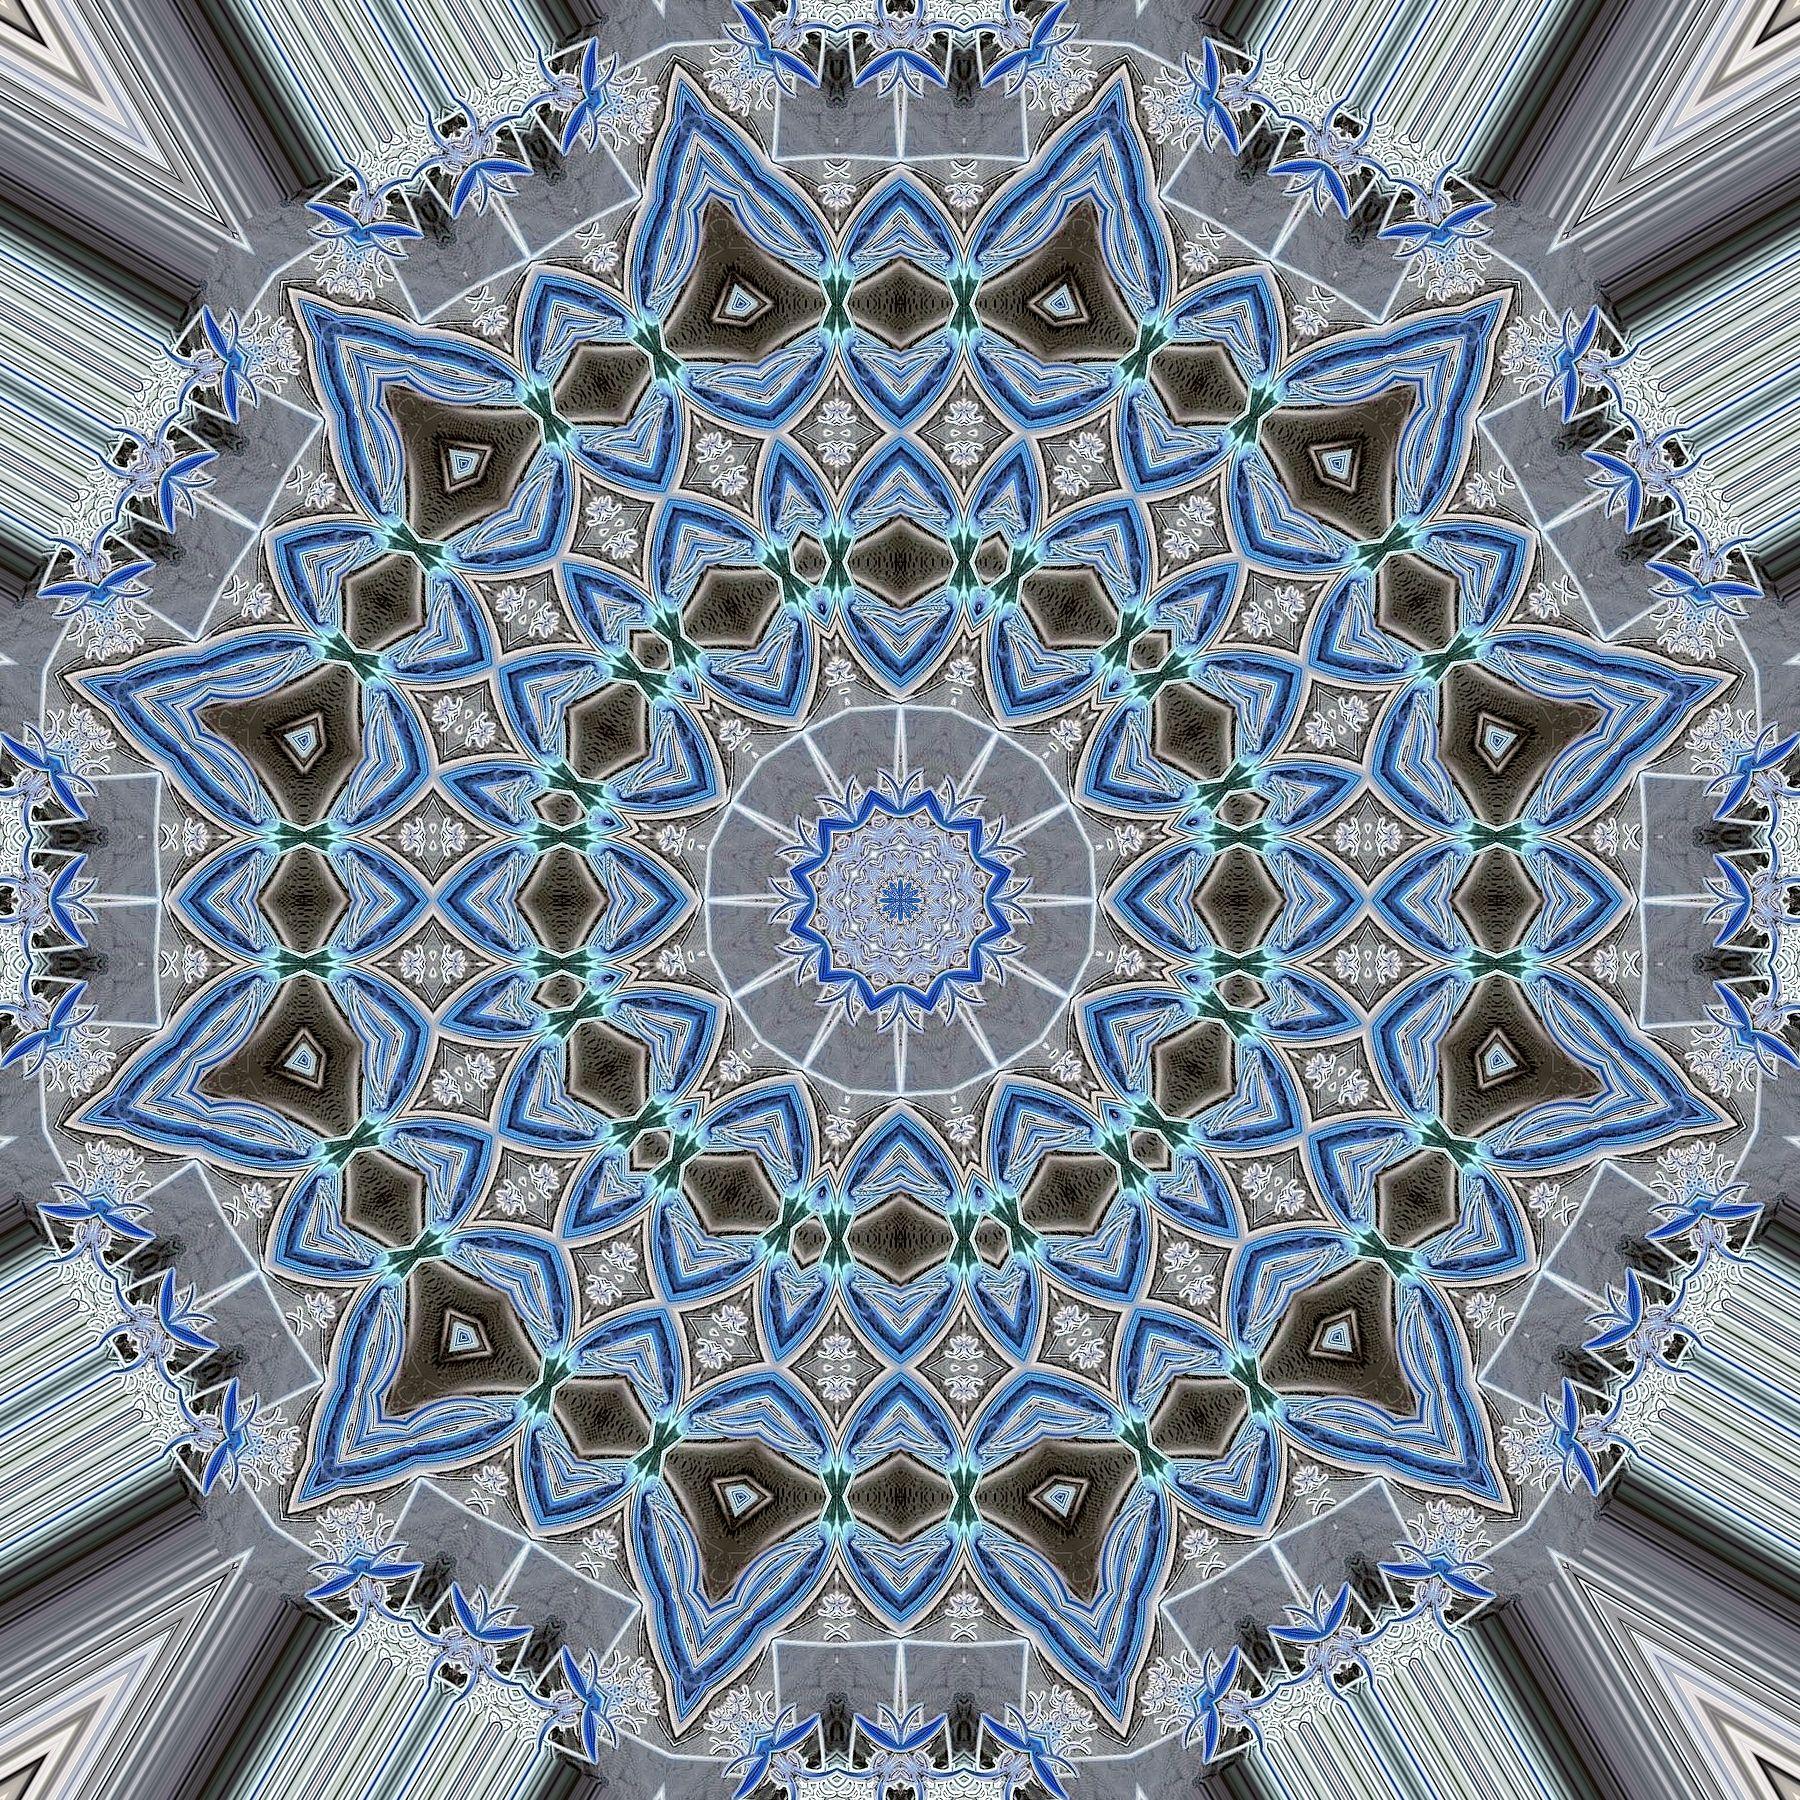 Blue Spade Mandala 3 by janclark.deviantart.com on @DeviantArt